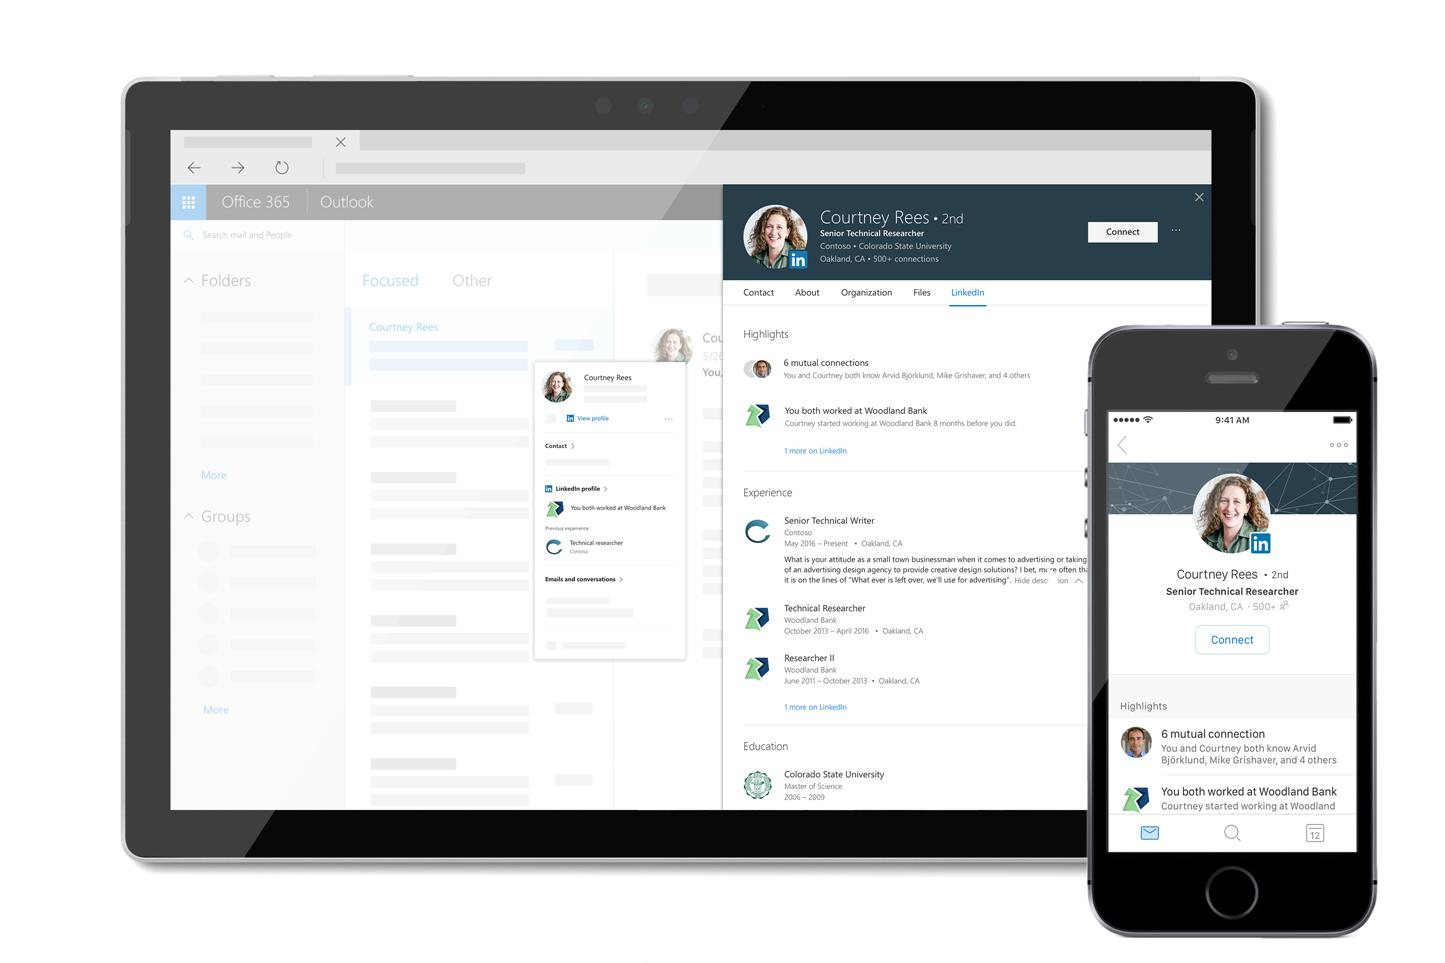 LinkedIn באפליקציות Microsoft